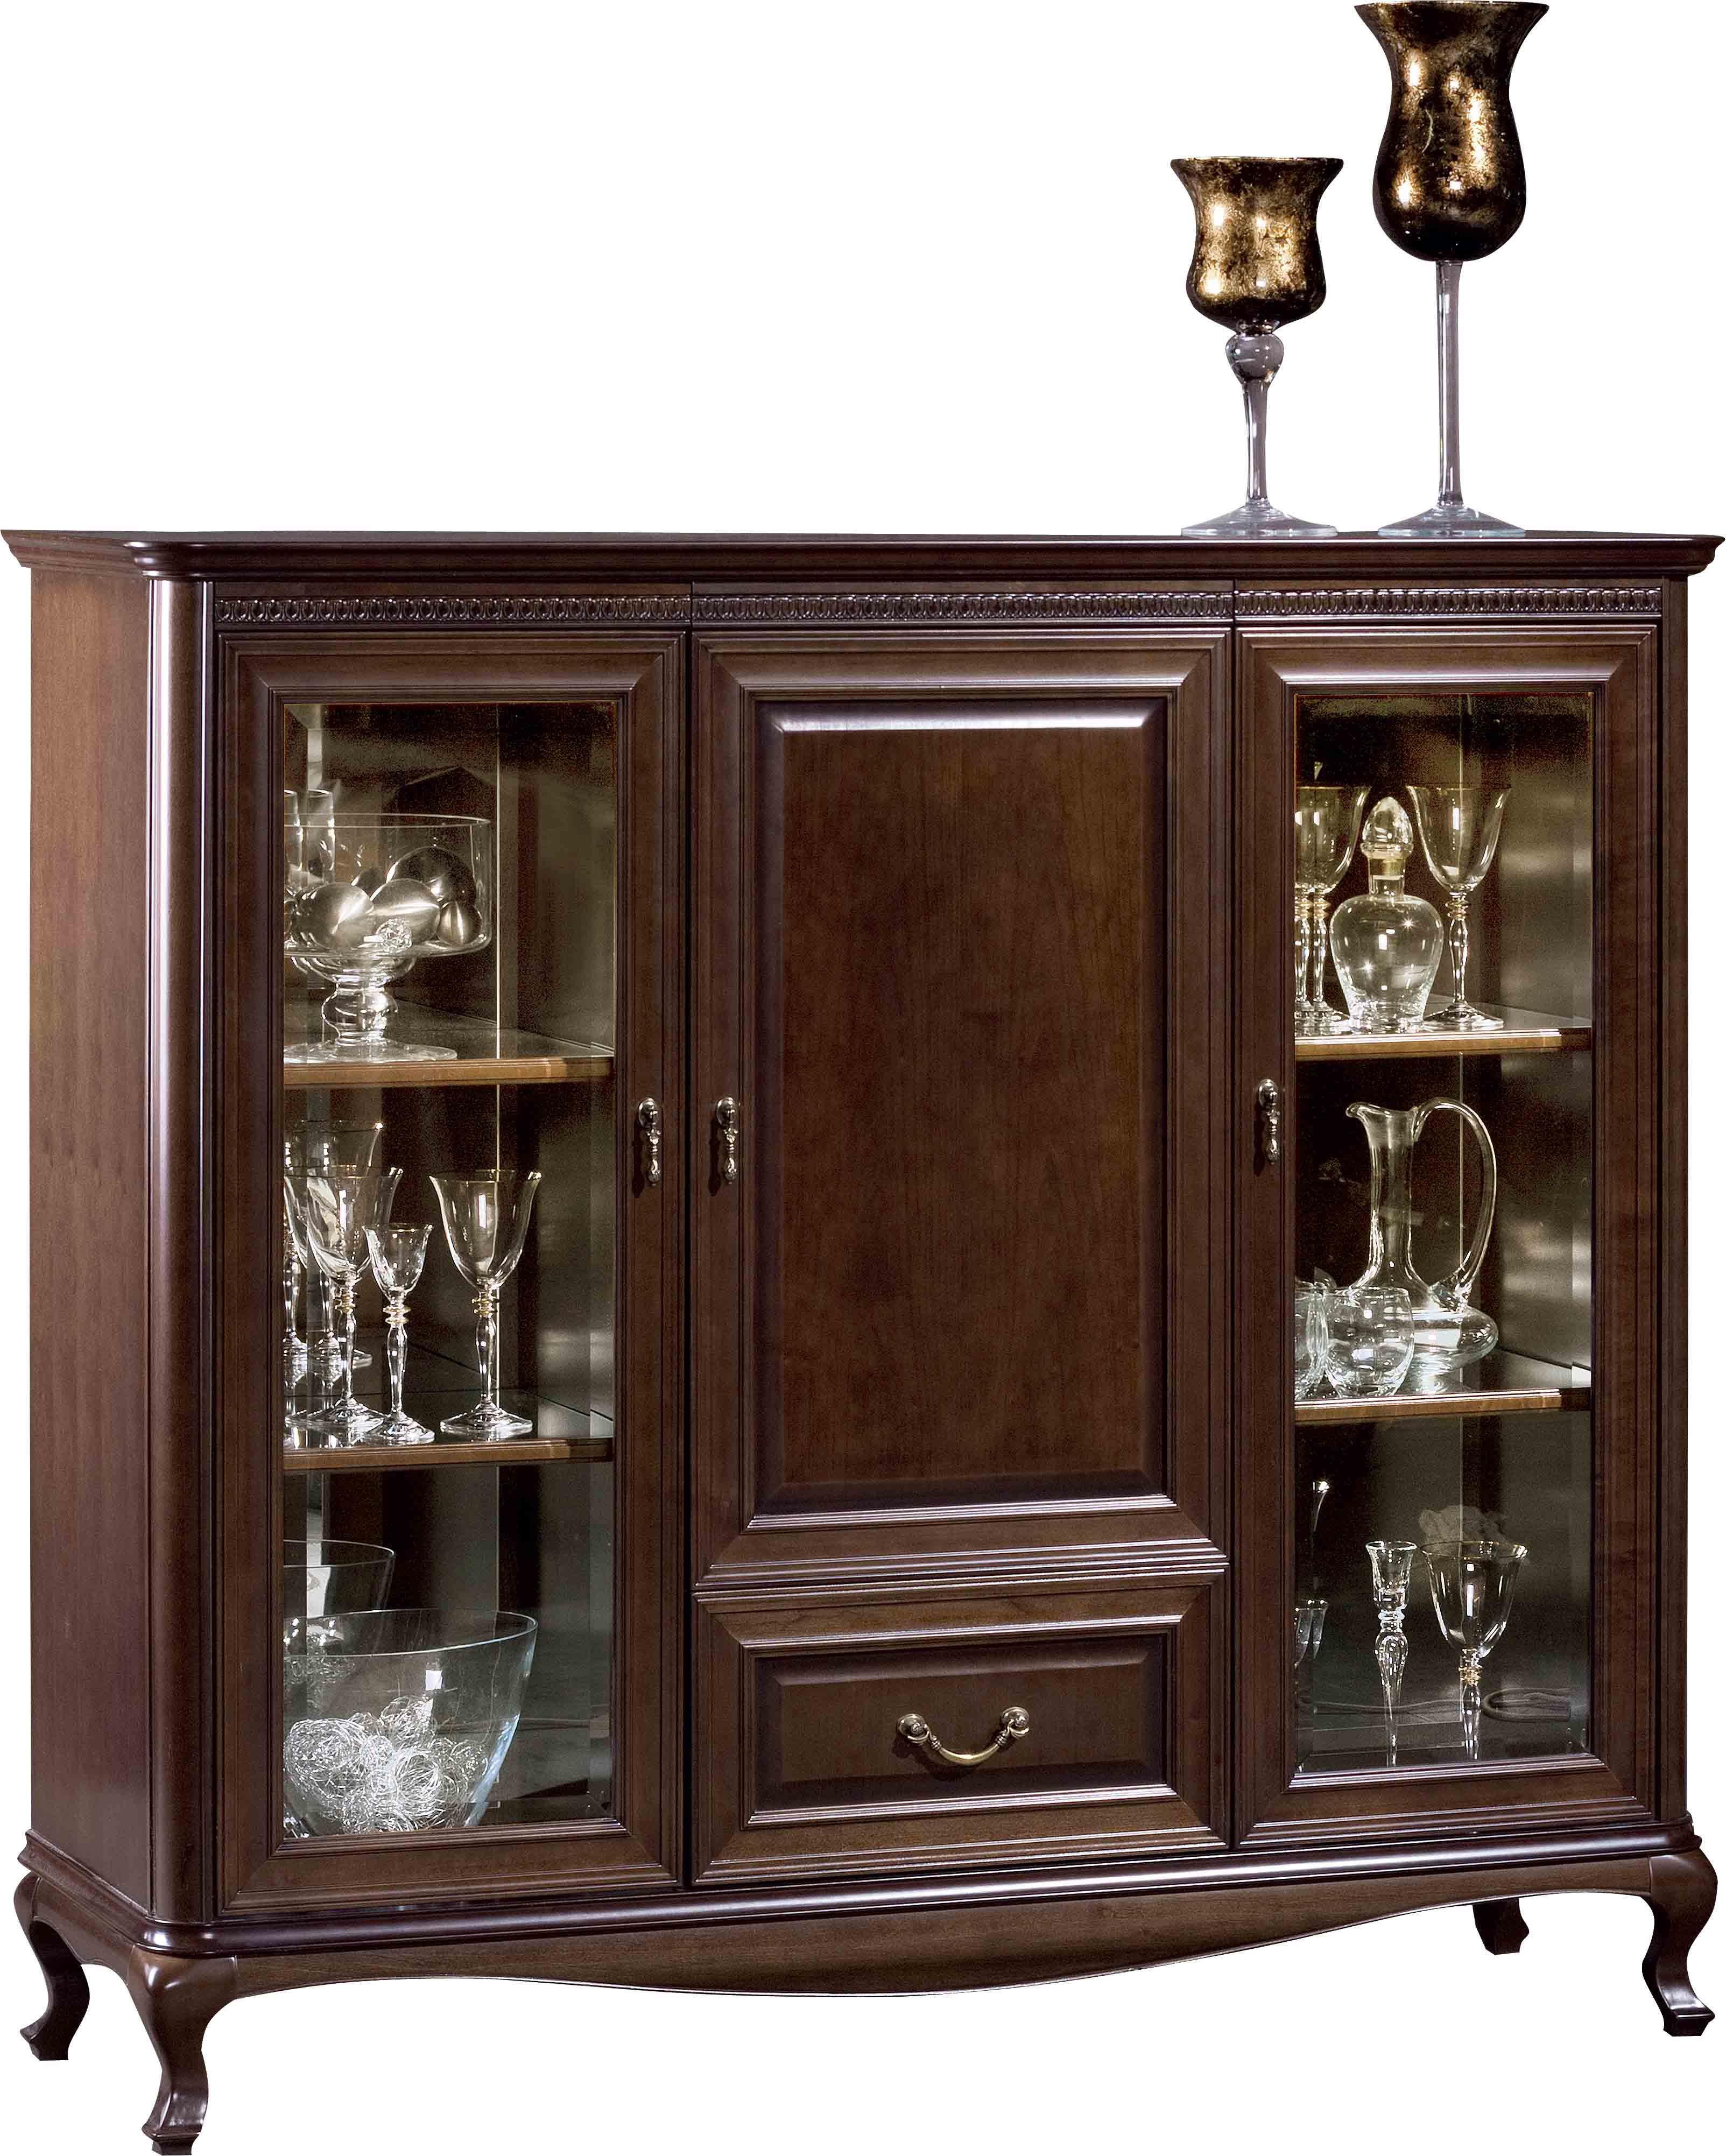 Бар шкаф V-KB Verona - арт мебели естествено дърво